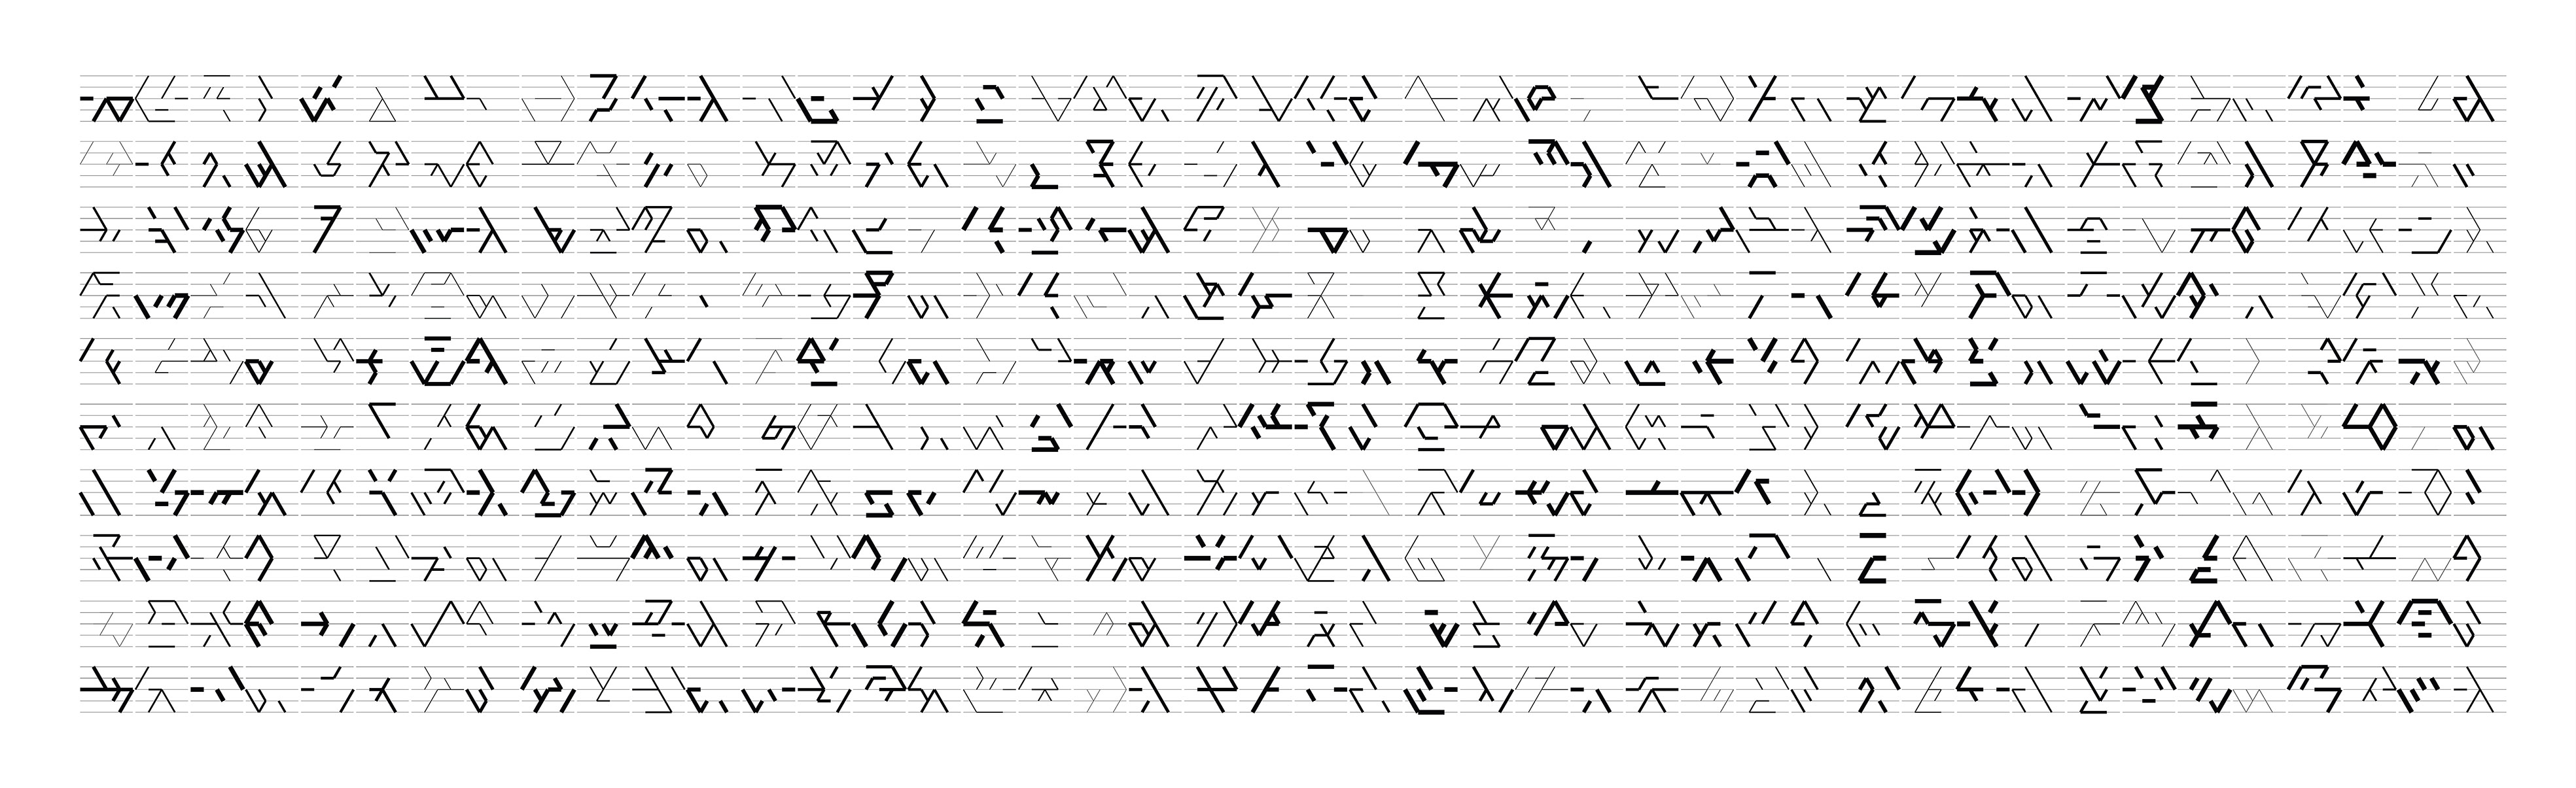 Manfred Mohr, P2400-299_367_large_2, Inkjet auf Papier, 91,5 x 276 cm, 2018